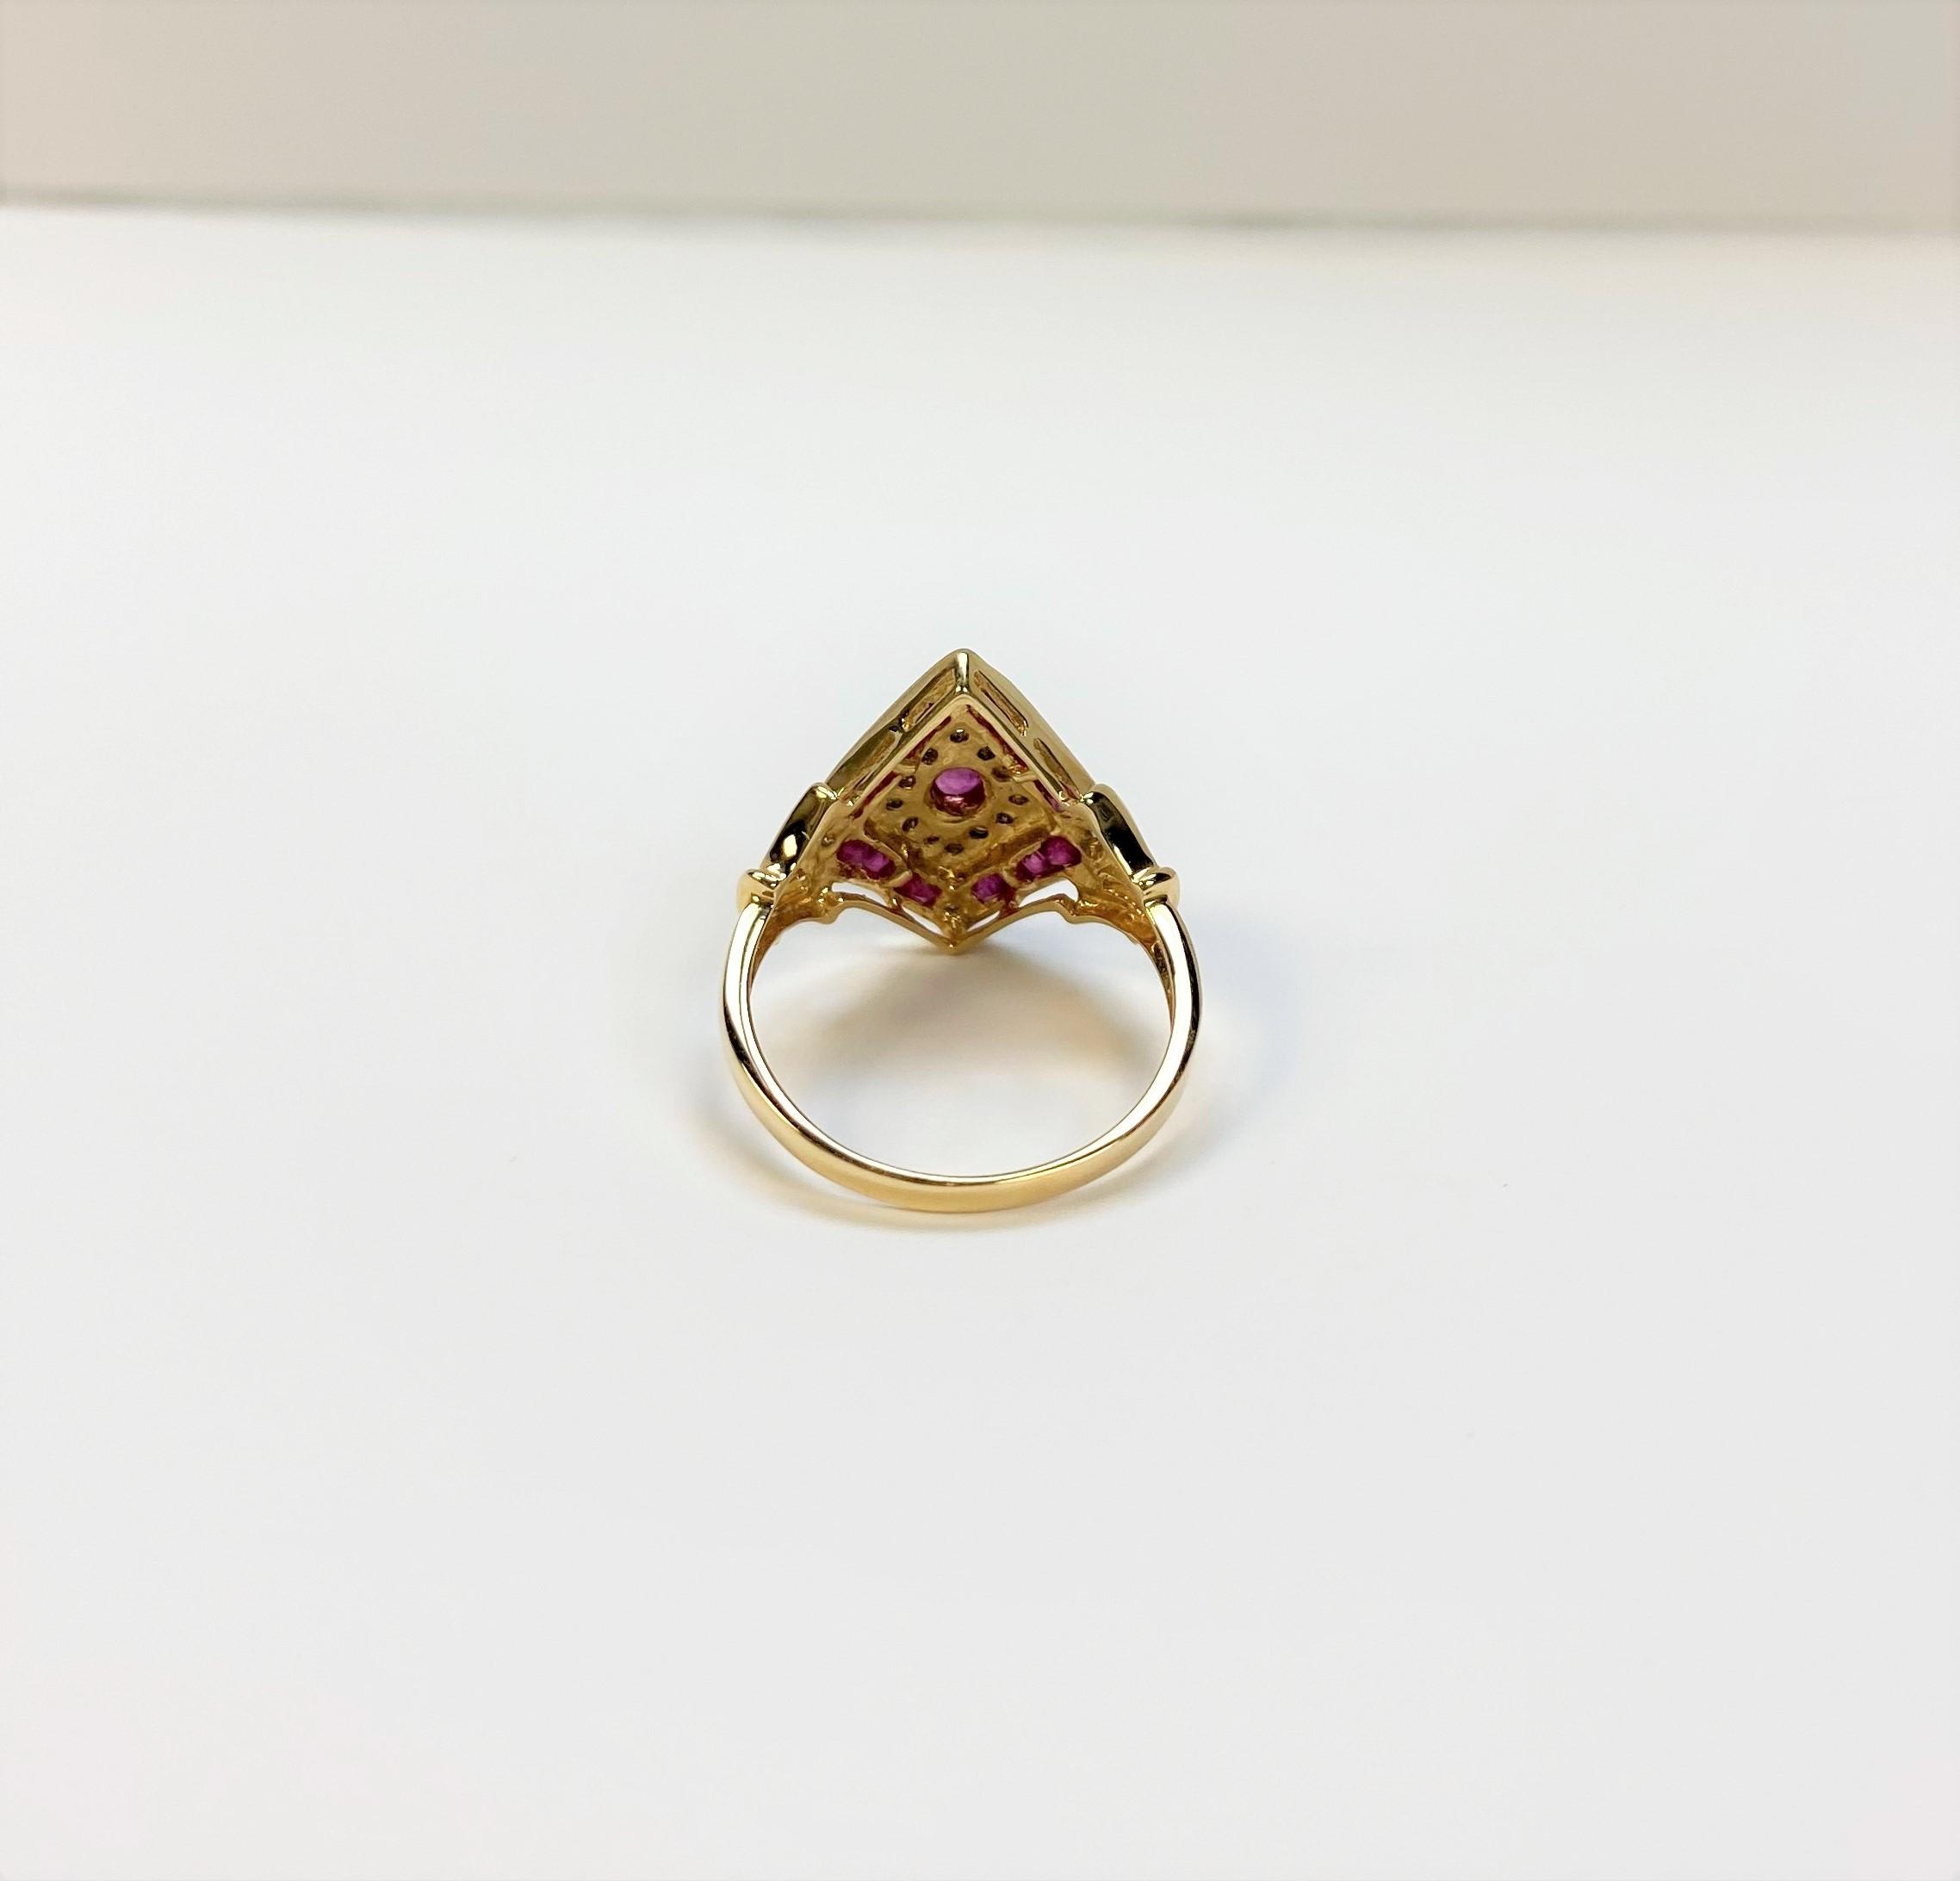 0.75 Carats Ruby Diamond Yellow Gold Ring